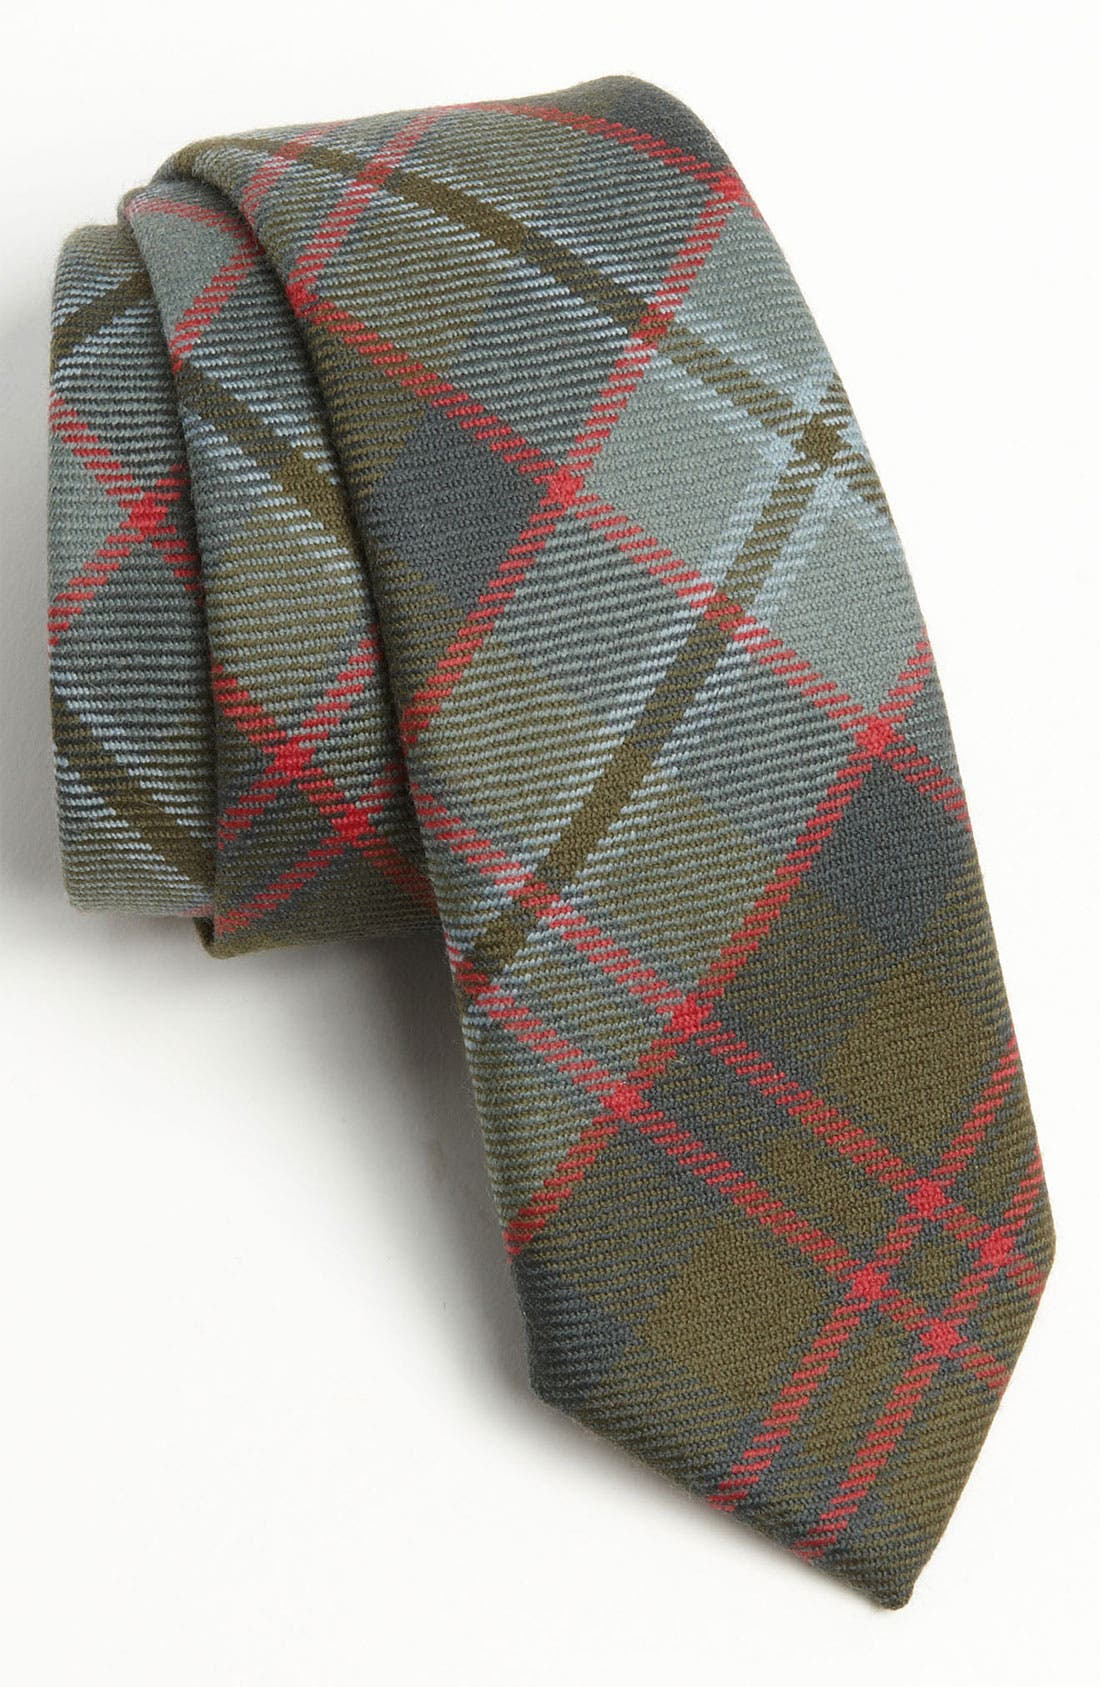 Alternate Image 1 Selected - David Hart Woven Tie